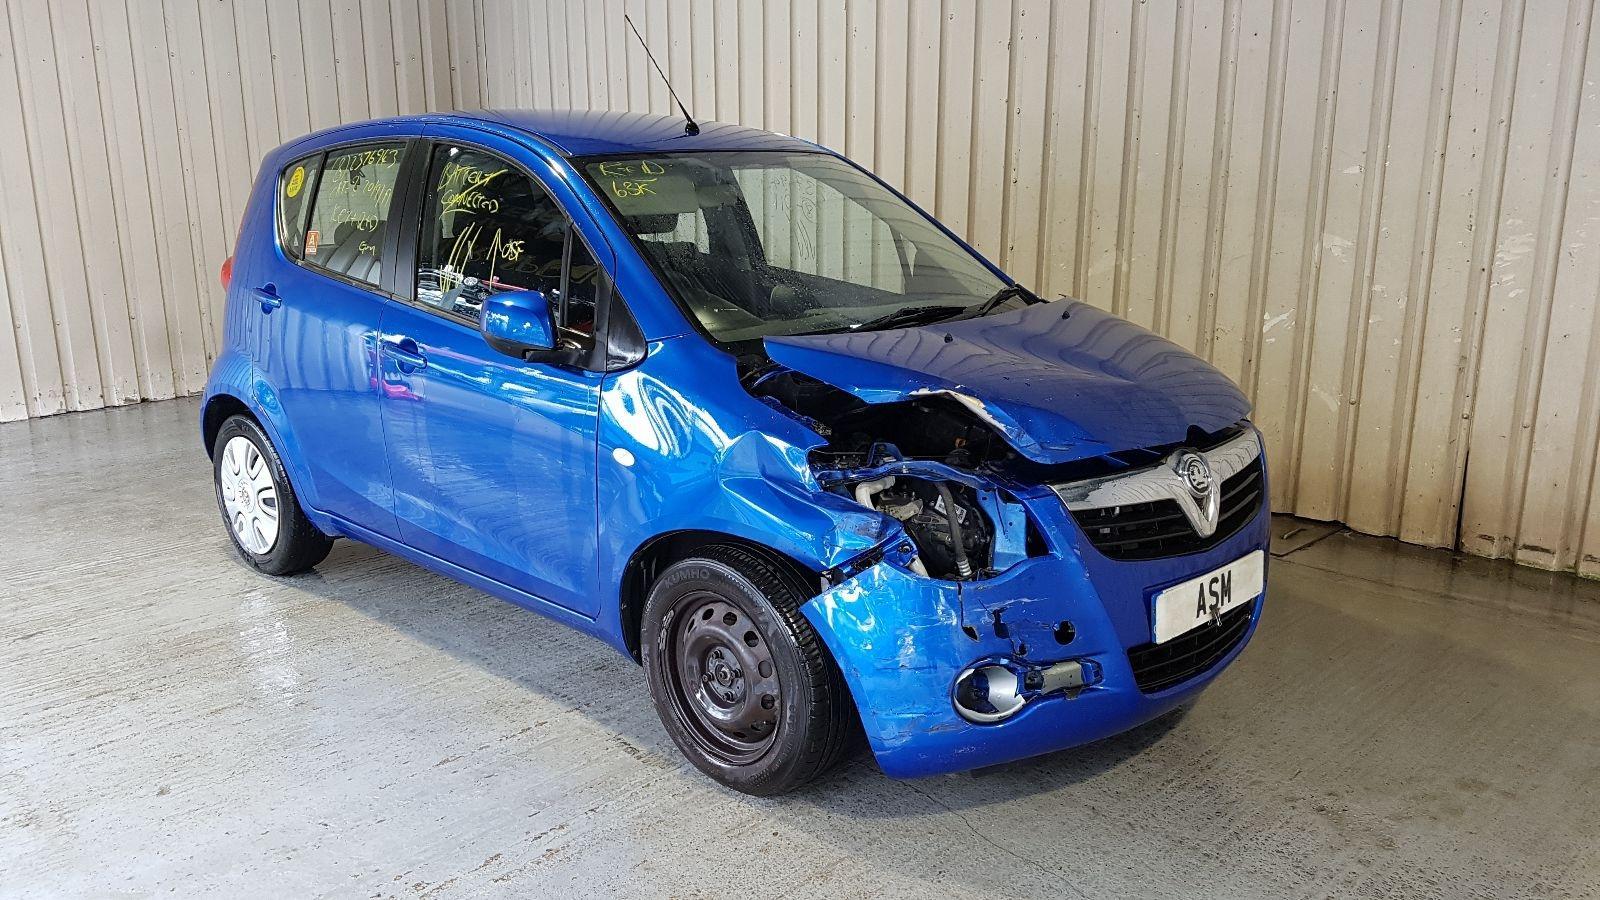 Image for a 2012 Vauxhall Agila 1.2 Petrol K12B Engine